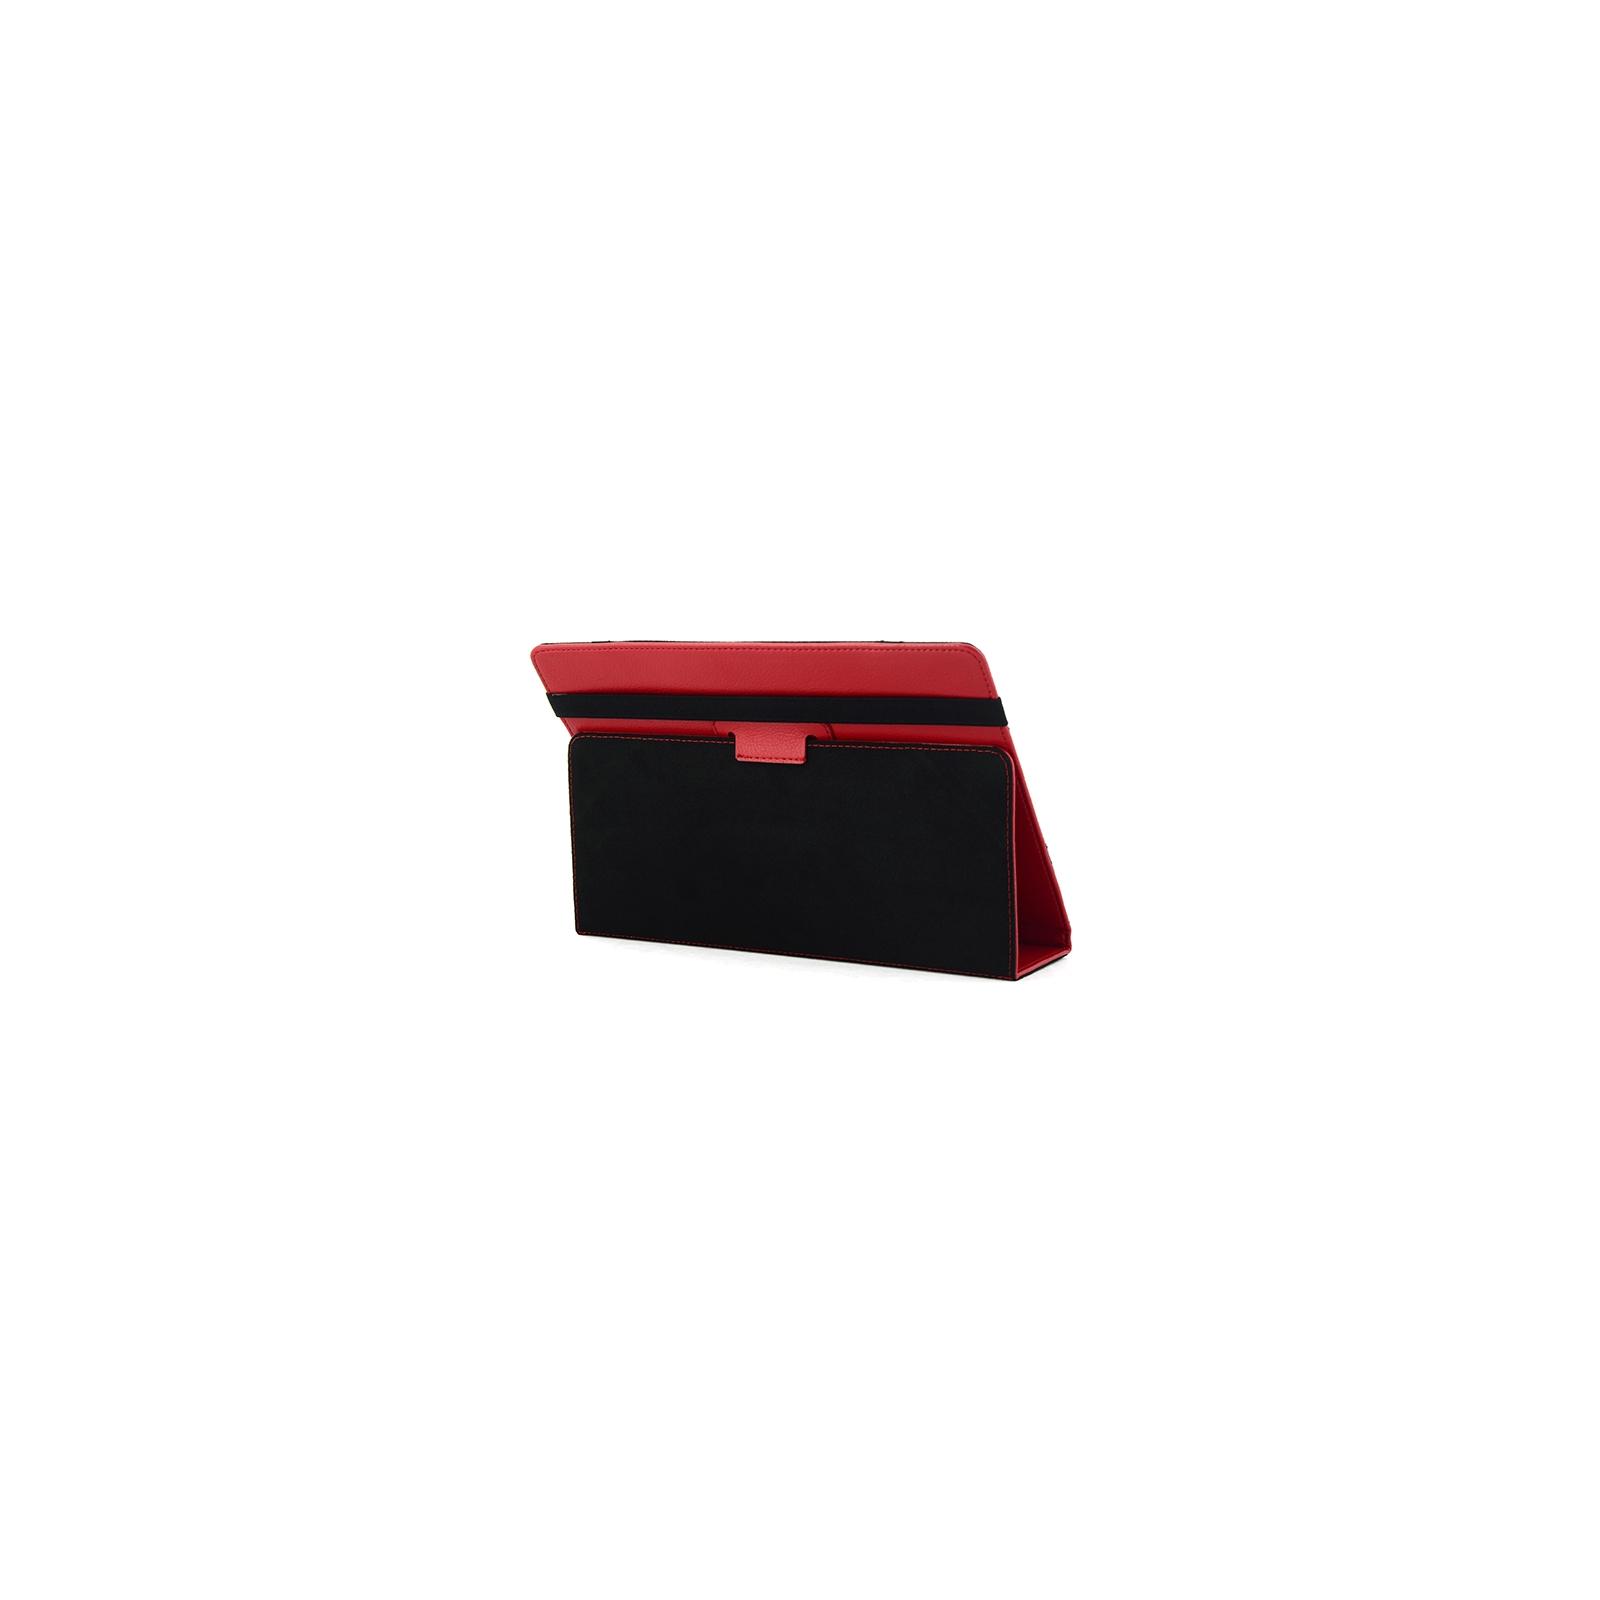 "Чехол для планшета 10""-10.1"" Cover Stand Red Drobak (216899) изображение 5"